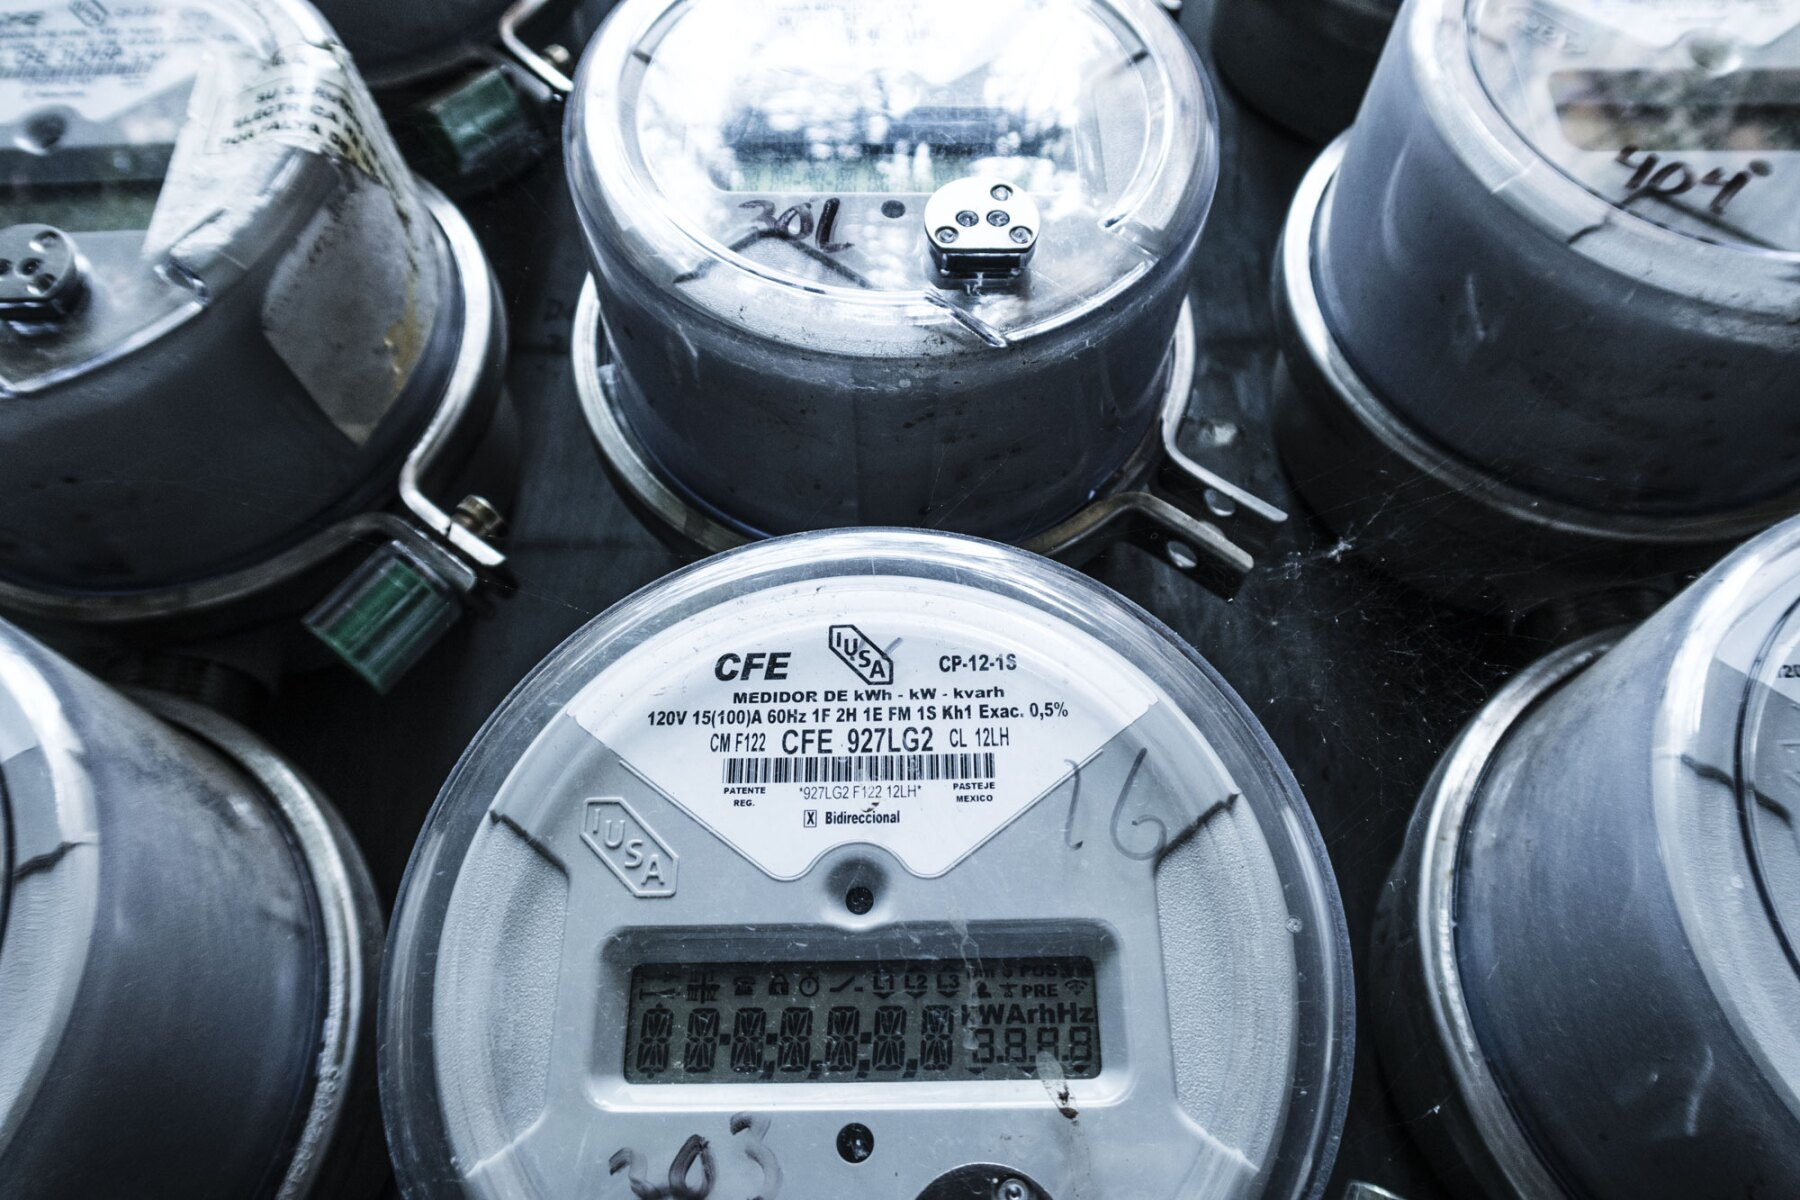 Medidores CFE